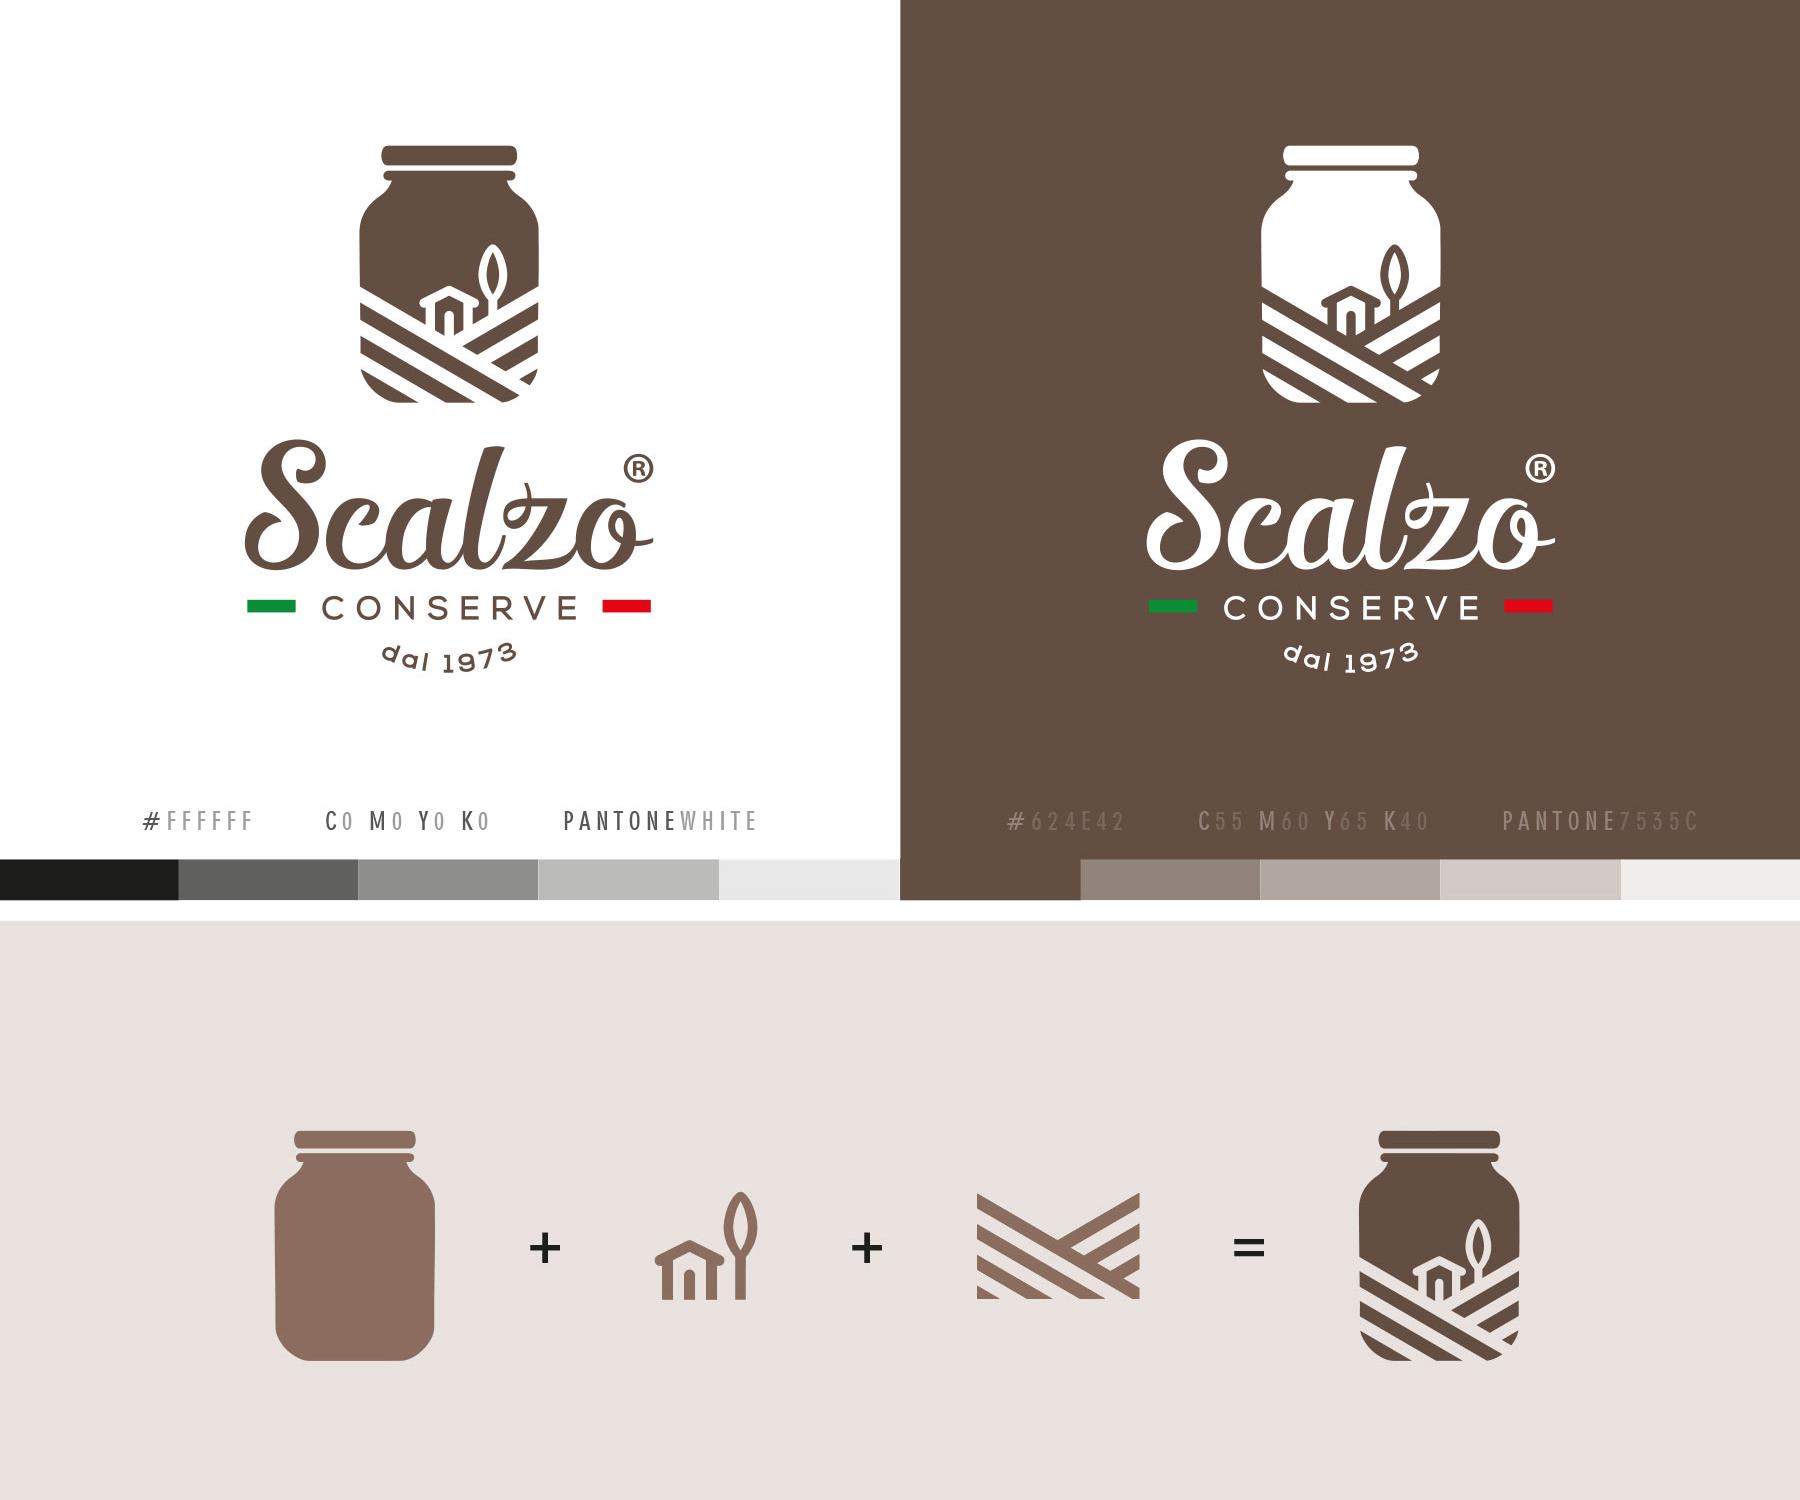 Studio La Regina - logo Scalzo Conserve